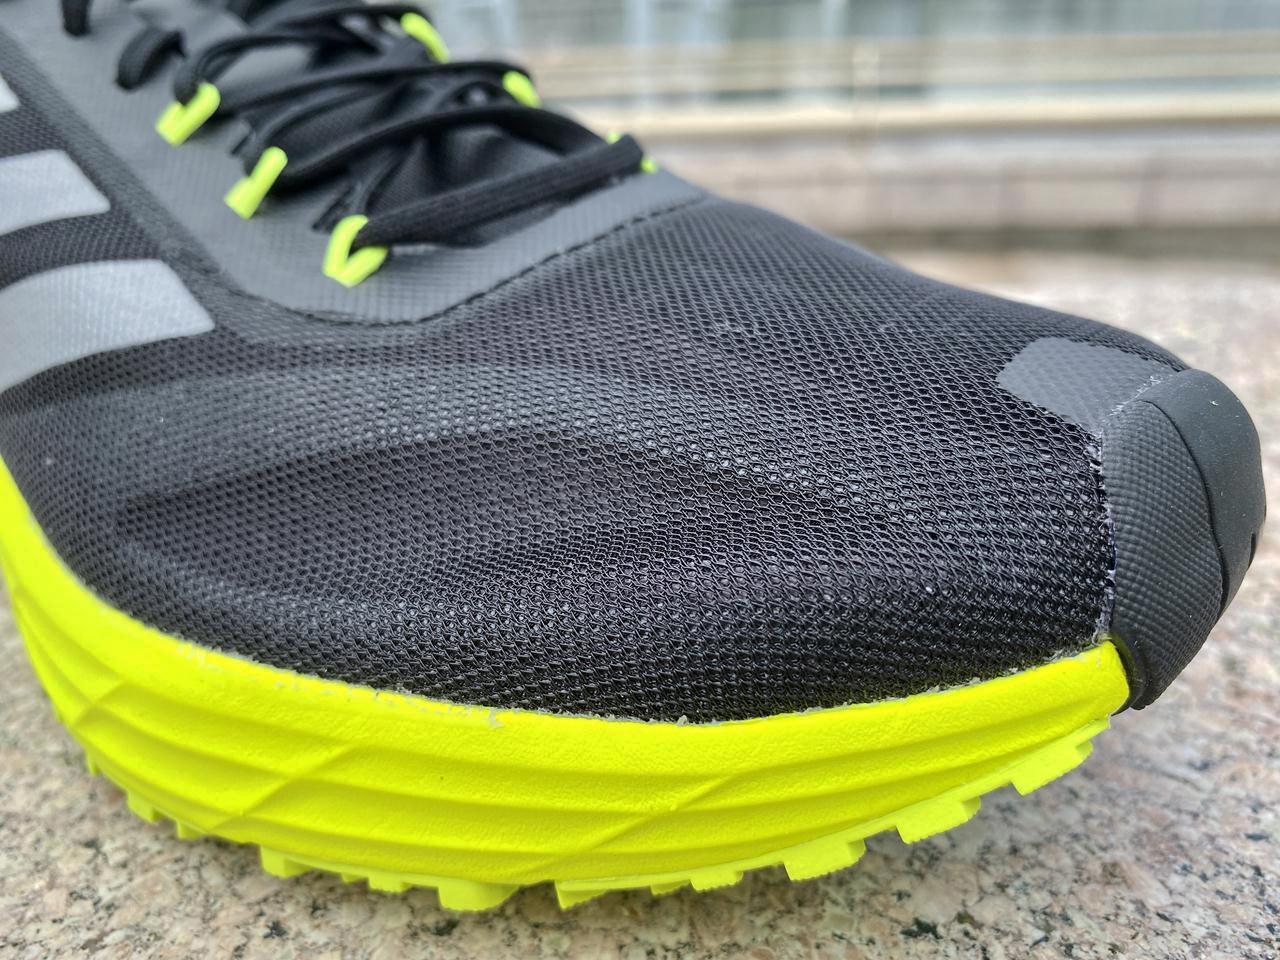 Adidas SL20.2 - Toe